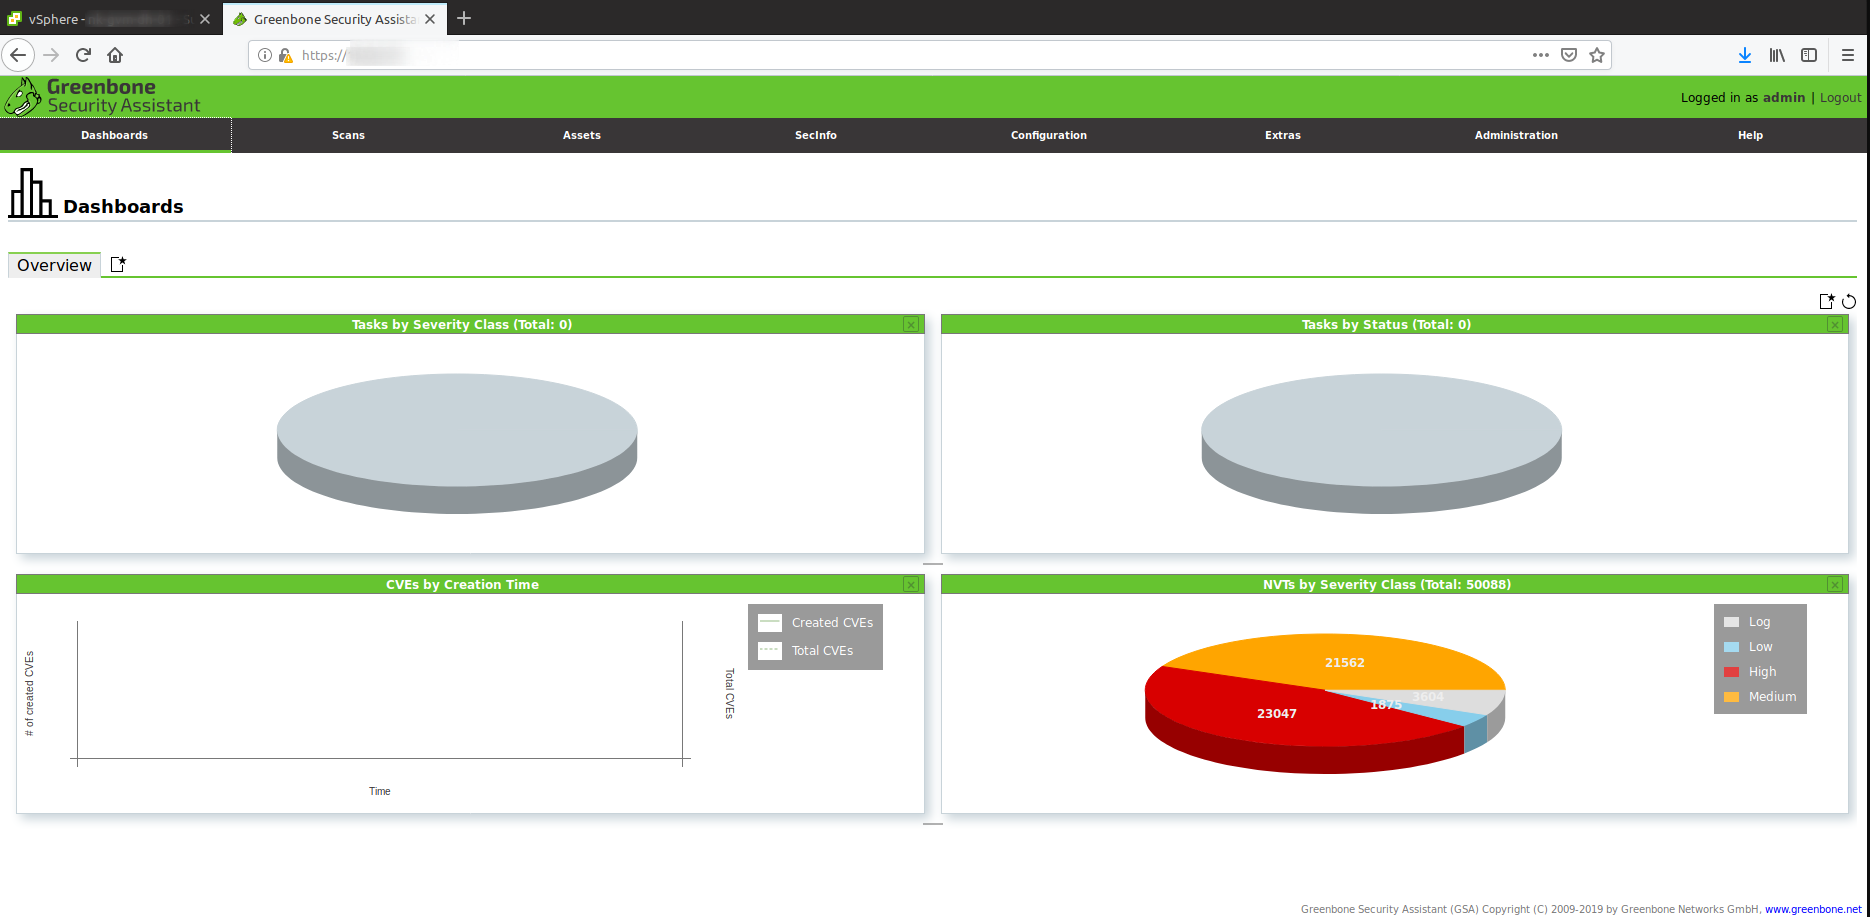 Greenbone Vulnerability Management 10 Docker Master/Slave